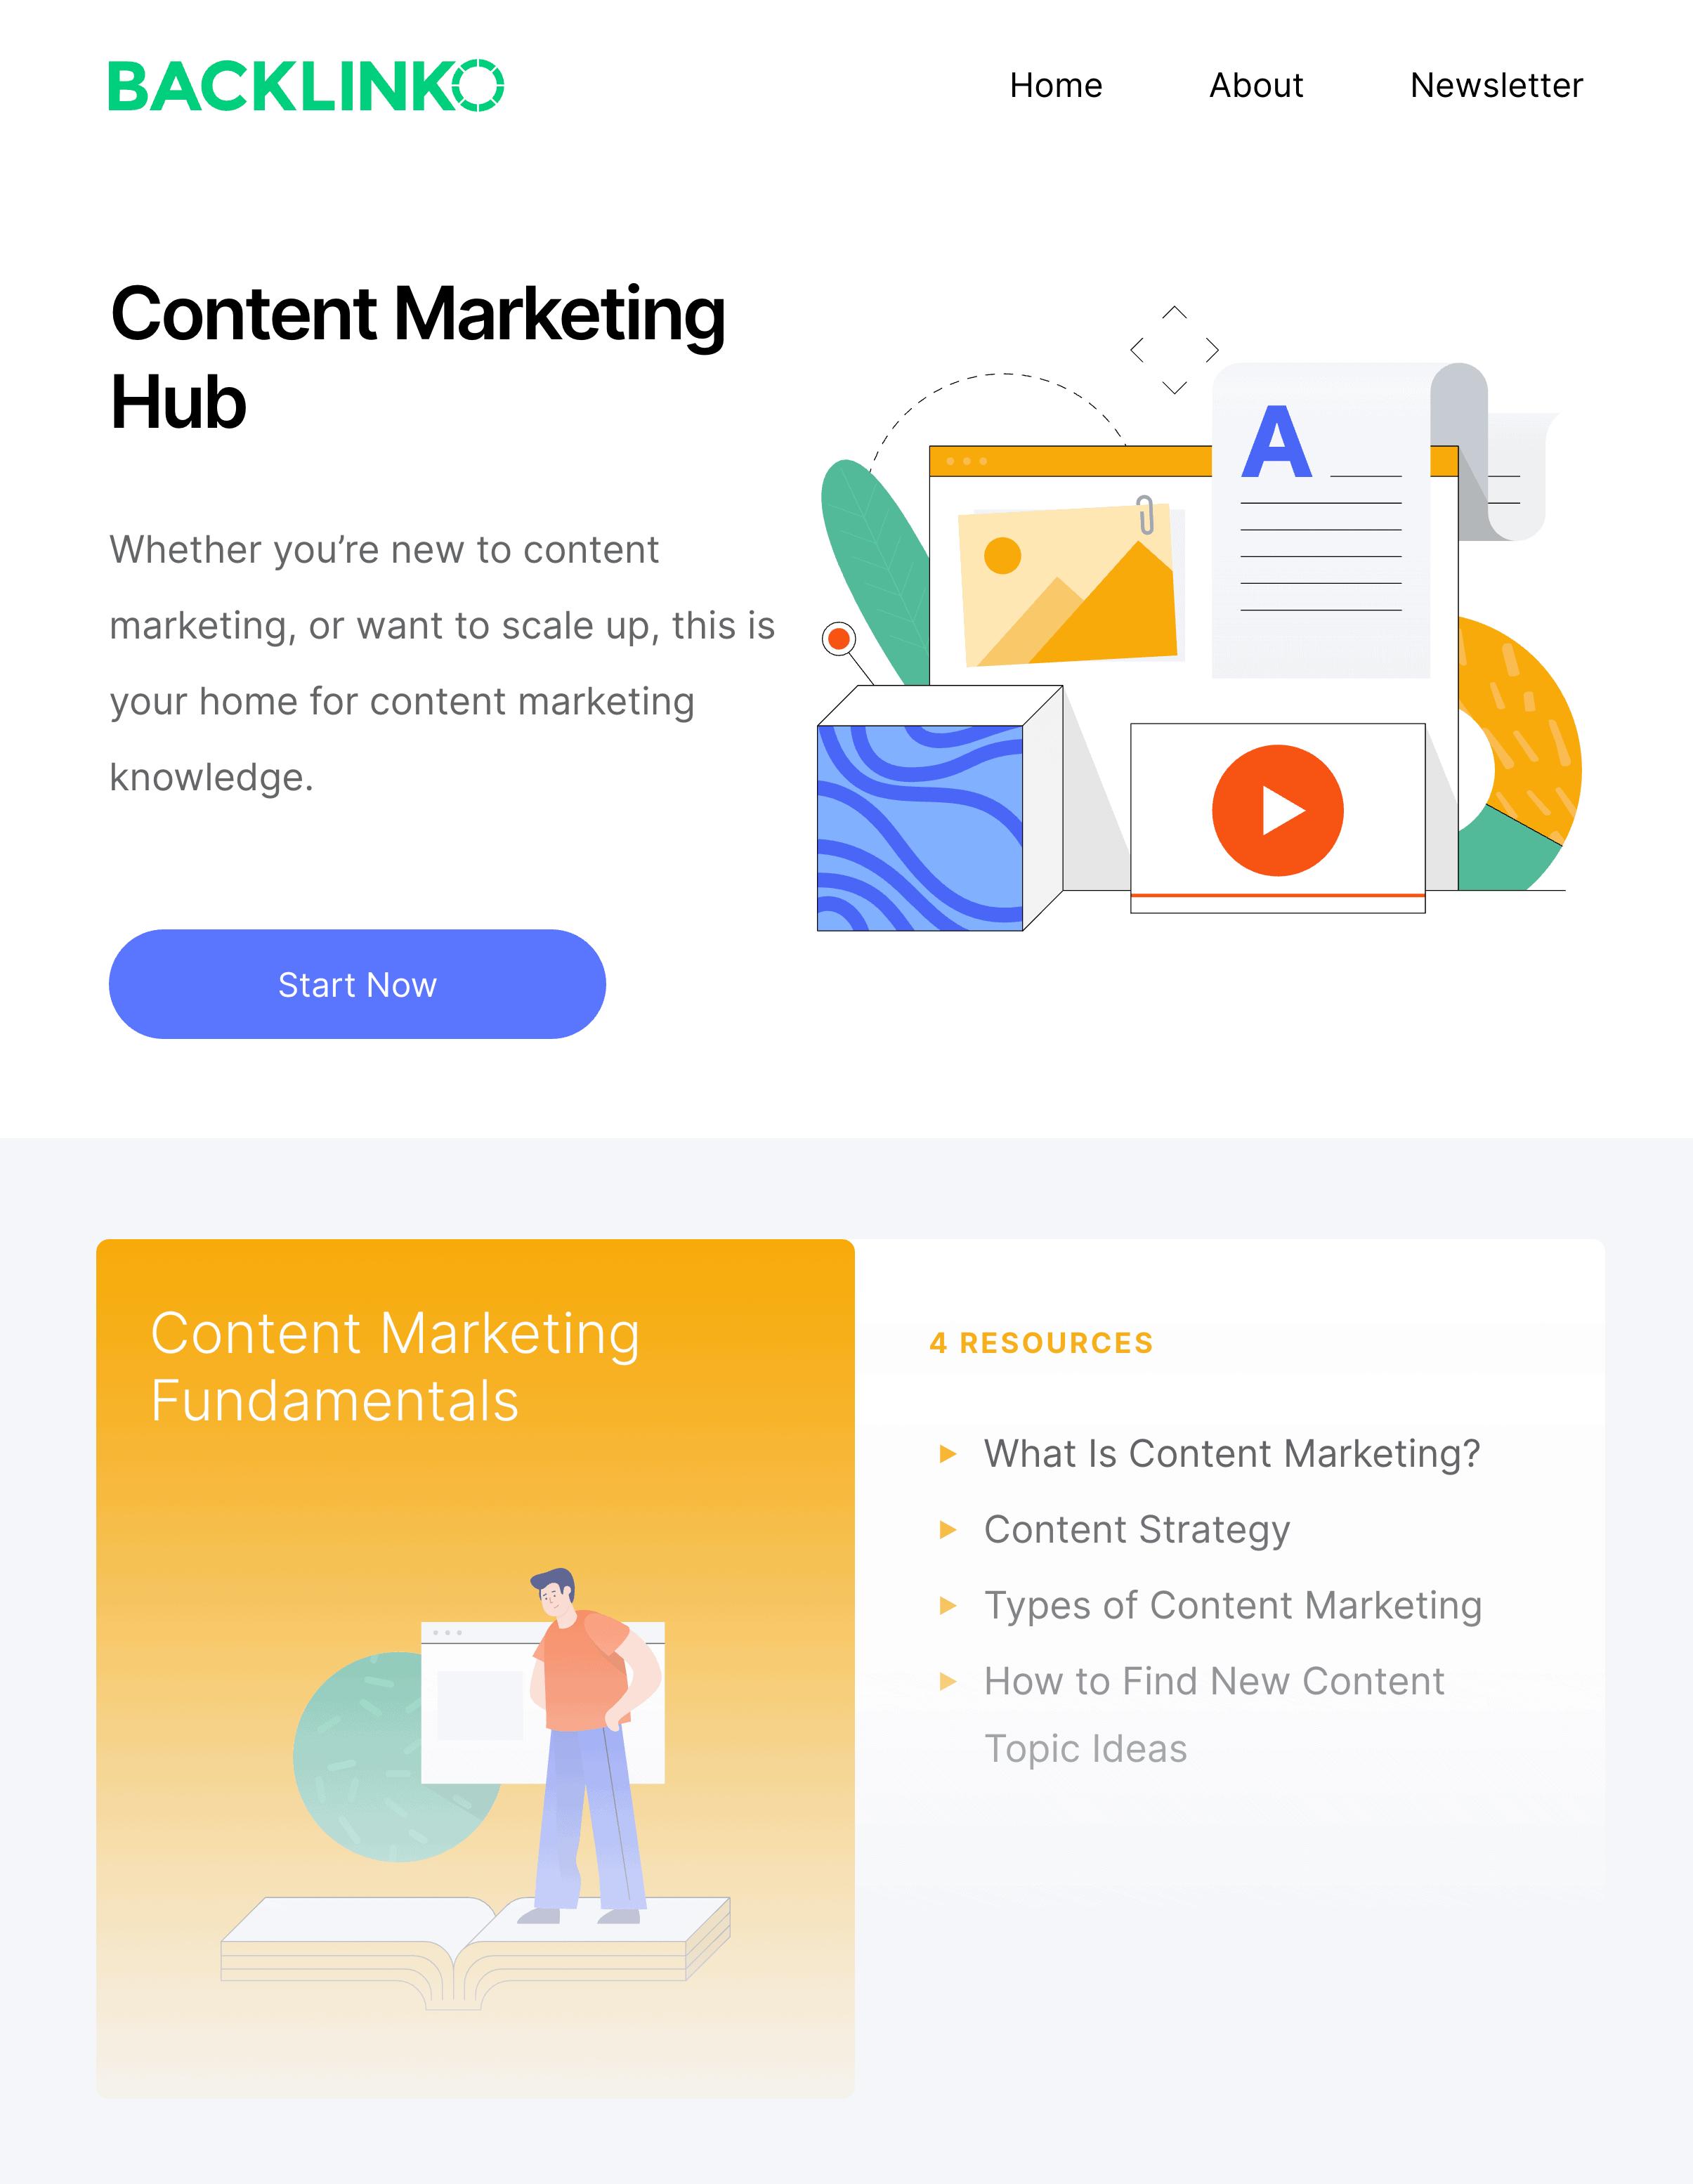 Backlinko – Content Marketing Hub